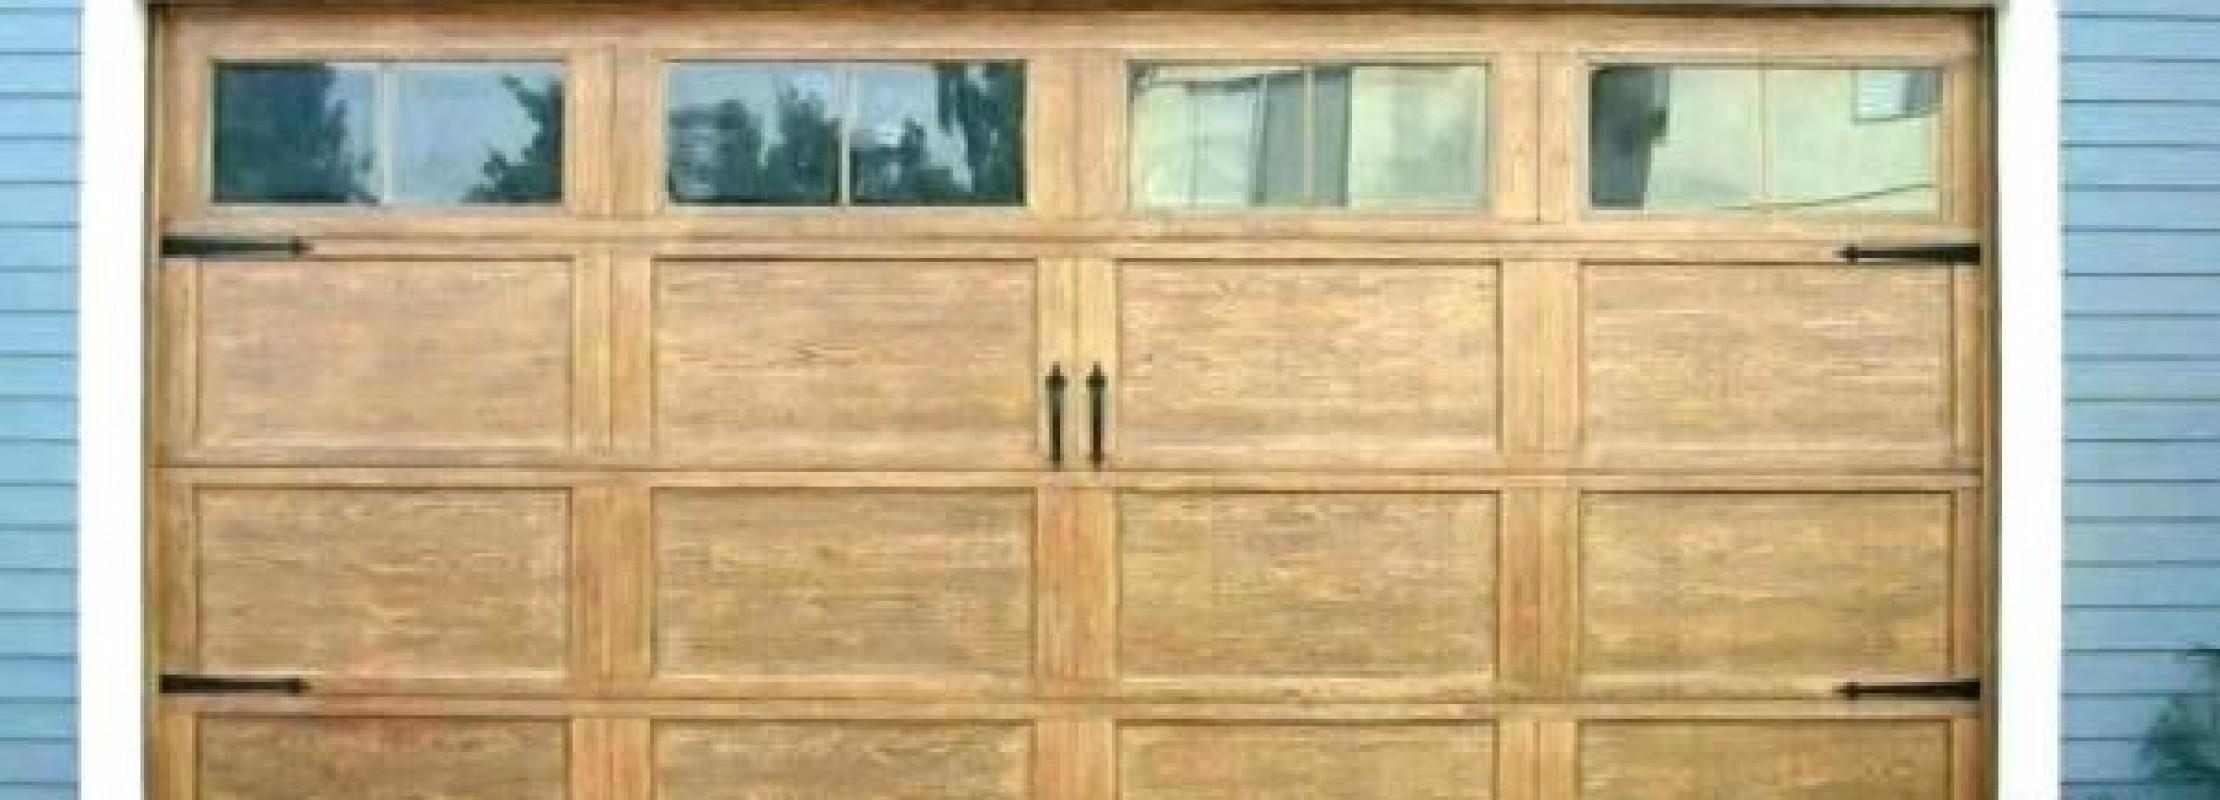 Come Costruire Un Garage In Legno Blog Edilnet